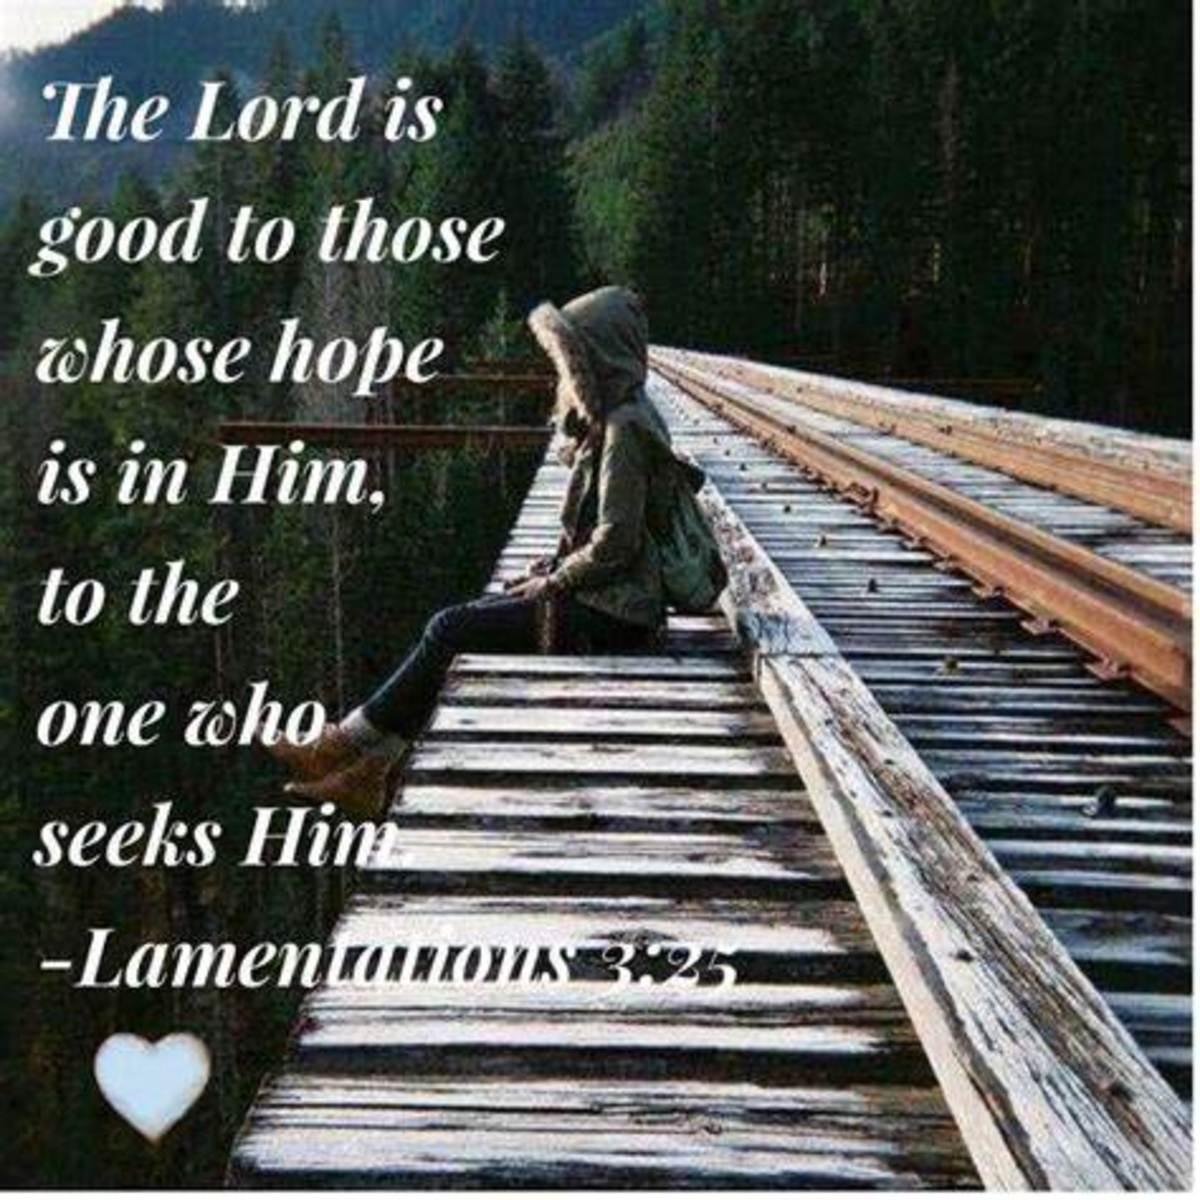 Those who blaspheme the Holy Spirit have no hope.